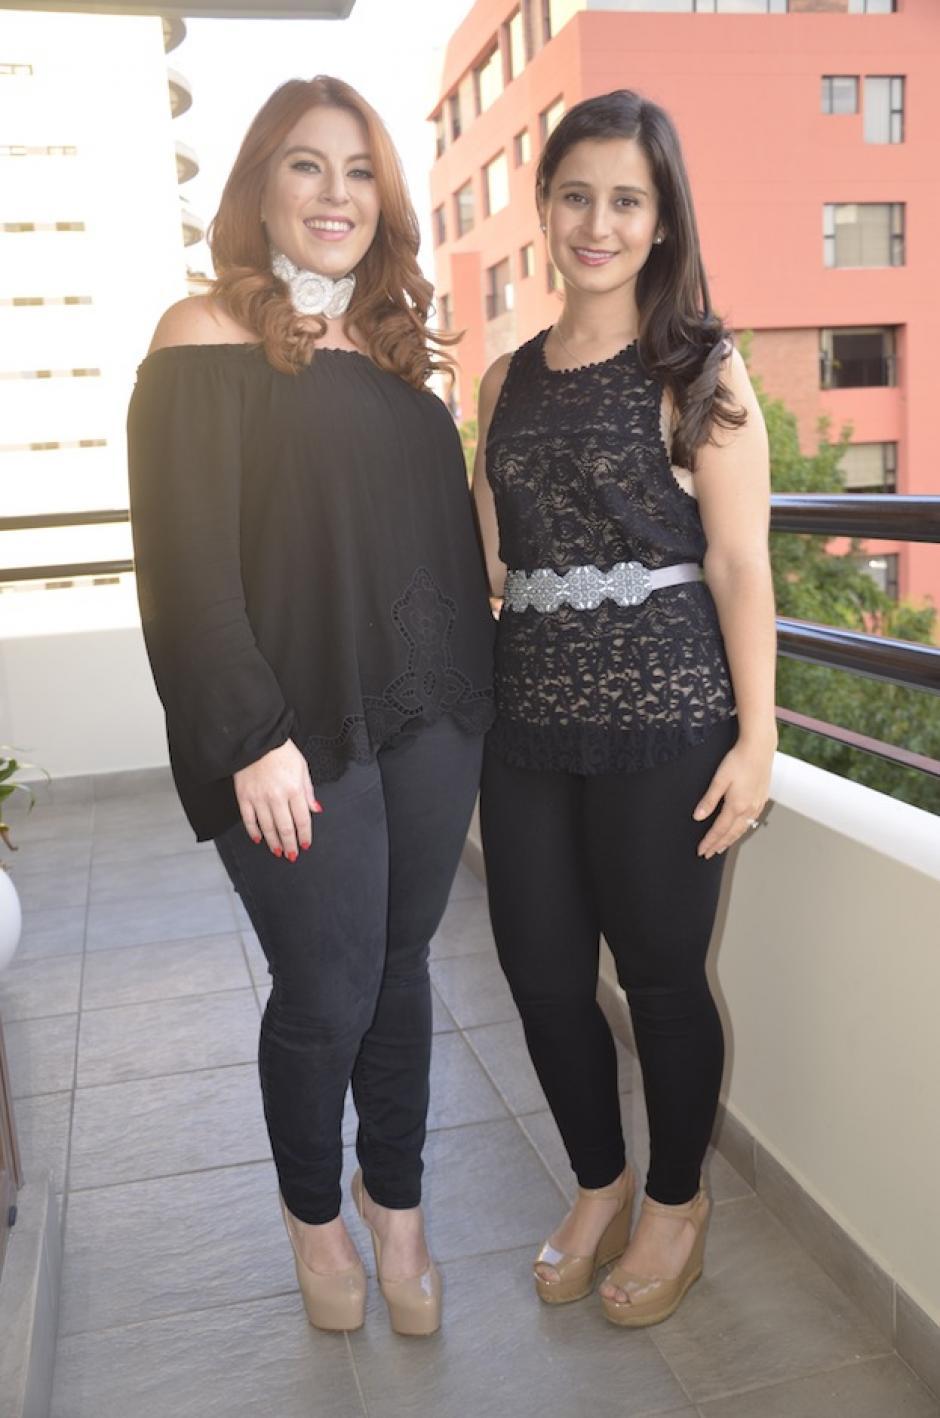 Gaby Porras y Marush Urruela fundaron la firma. (Foto: Selene Mejía/Soy502)